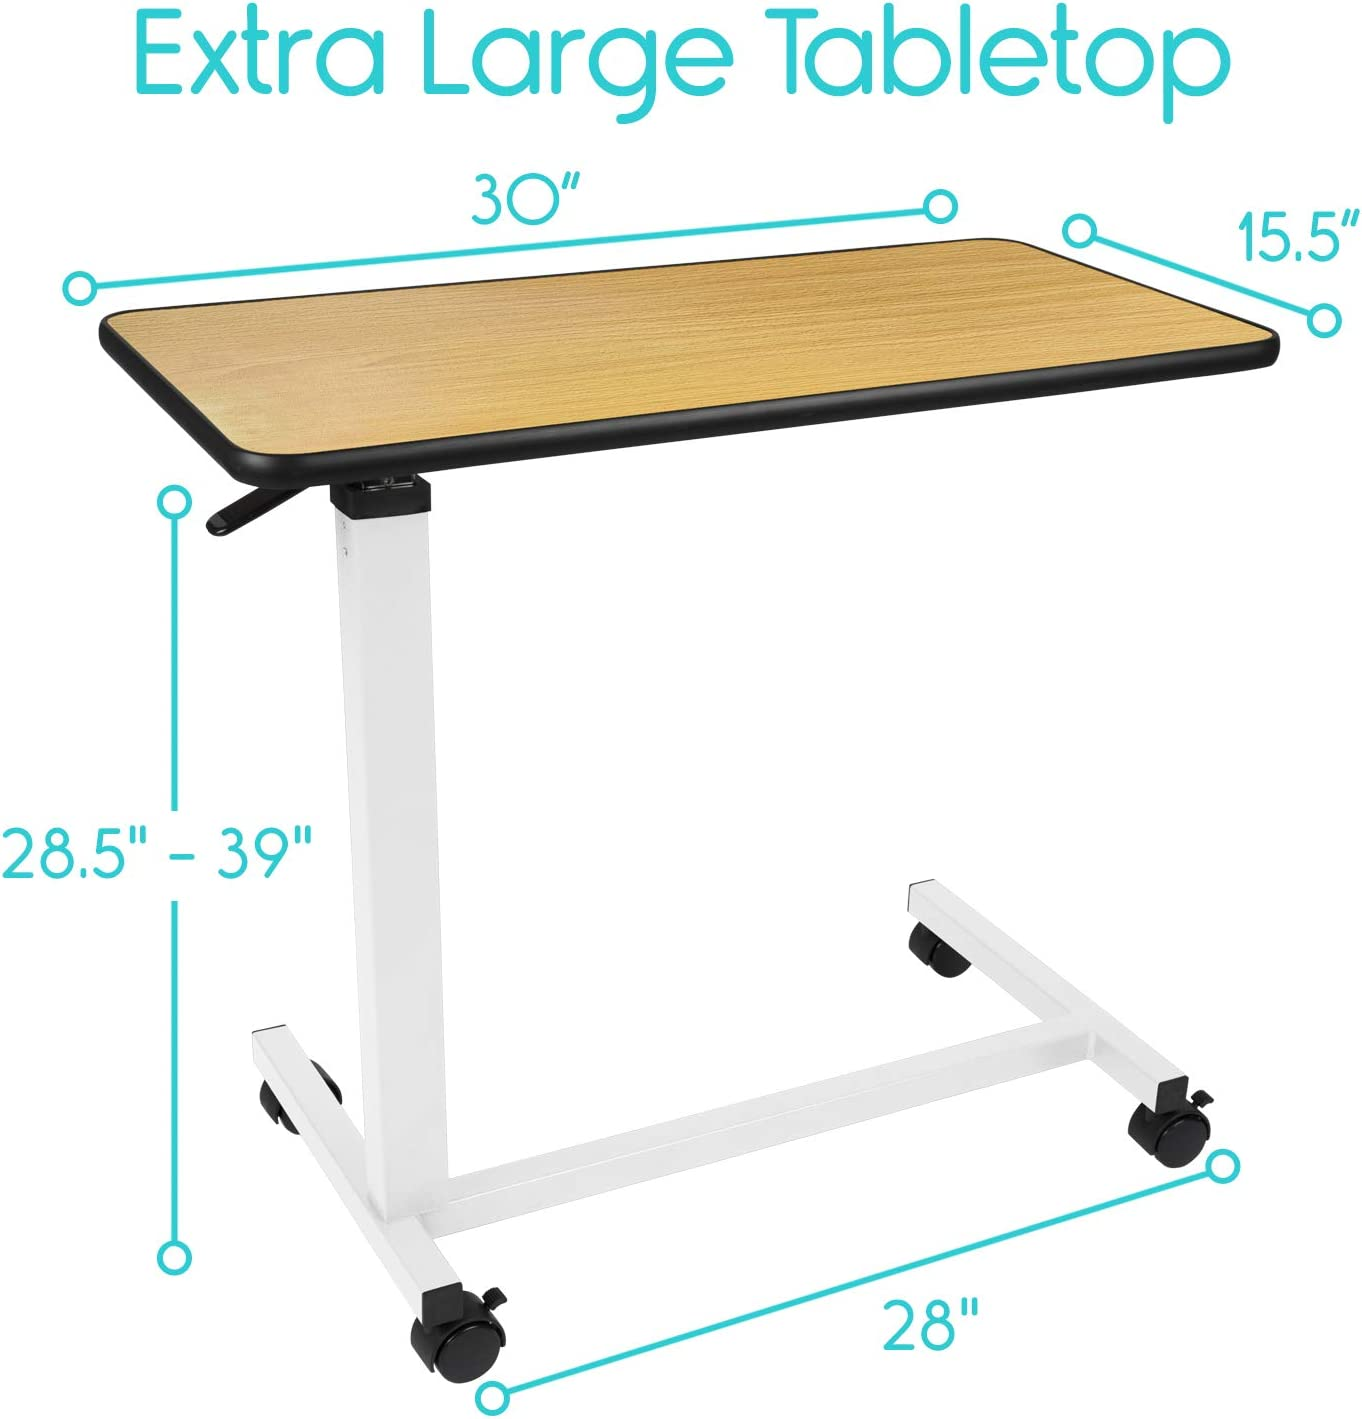 Vive Overbed Table (XL) - Hospital Bed Table - Swivel Wheel Rolling Tray - Adjustable Over Bedside Home Desk - Laptop, Reading, Eating Breakfast Cart Stand - Bedridden, Elderly, Senior Patient Aid: Kitchen & Dining